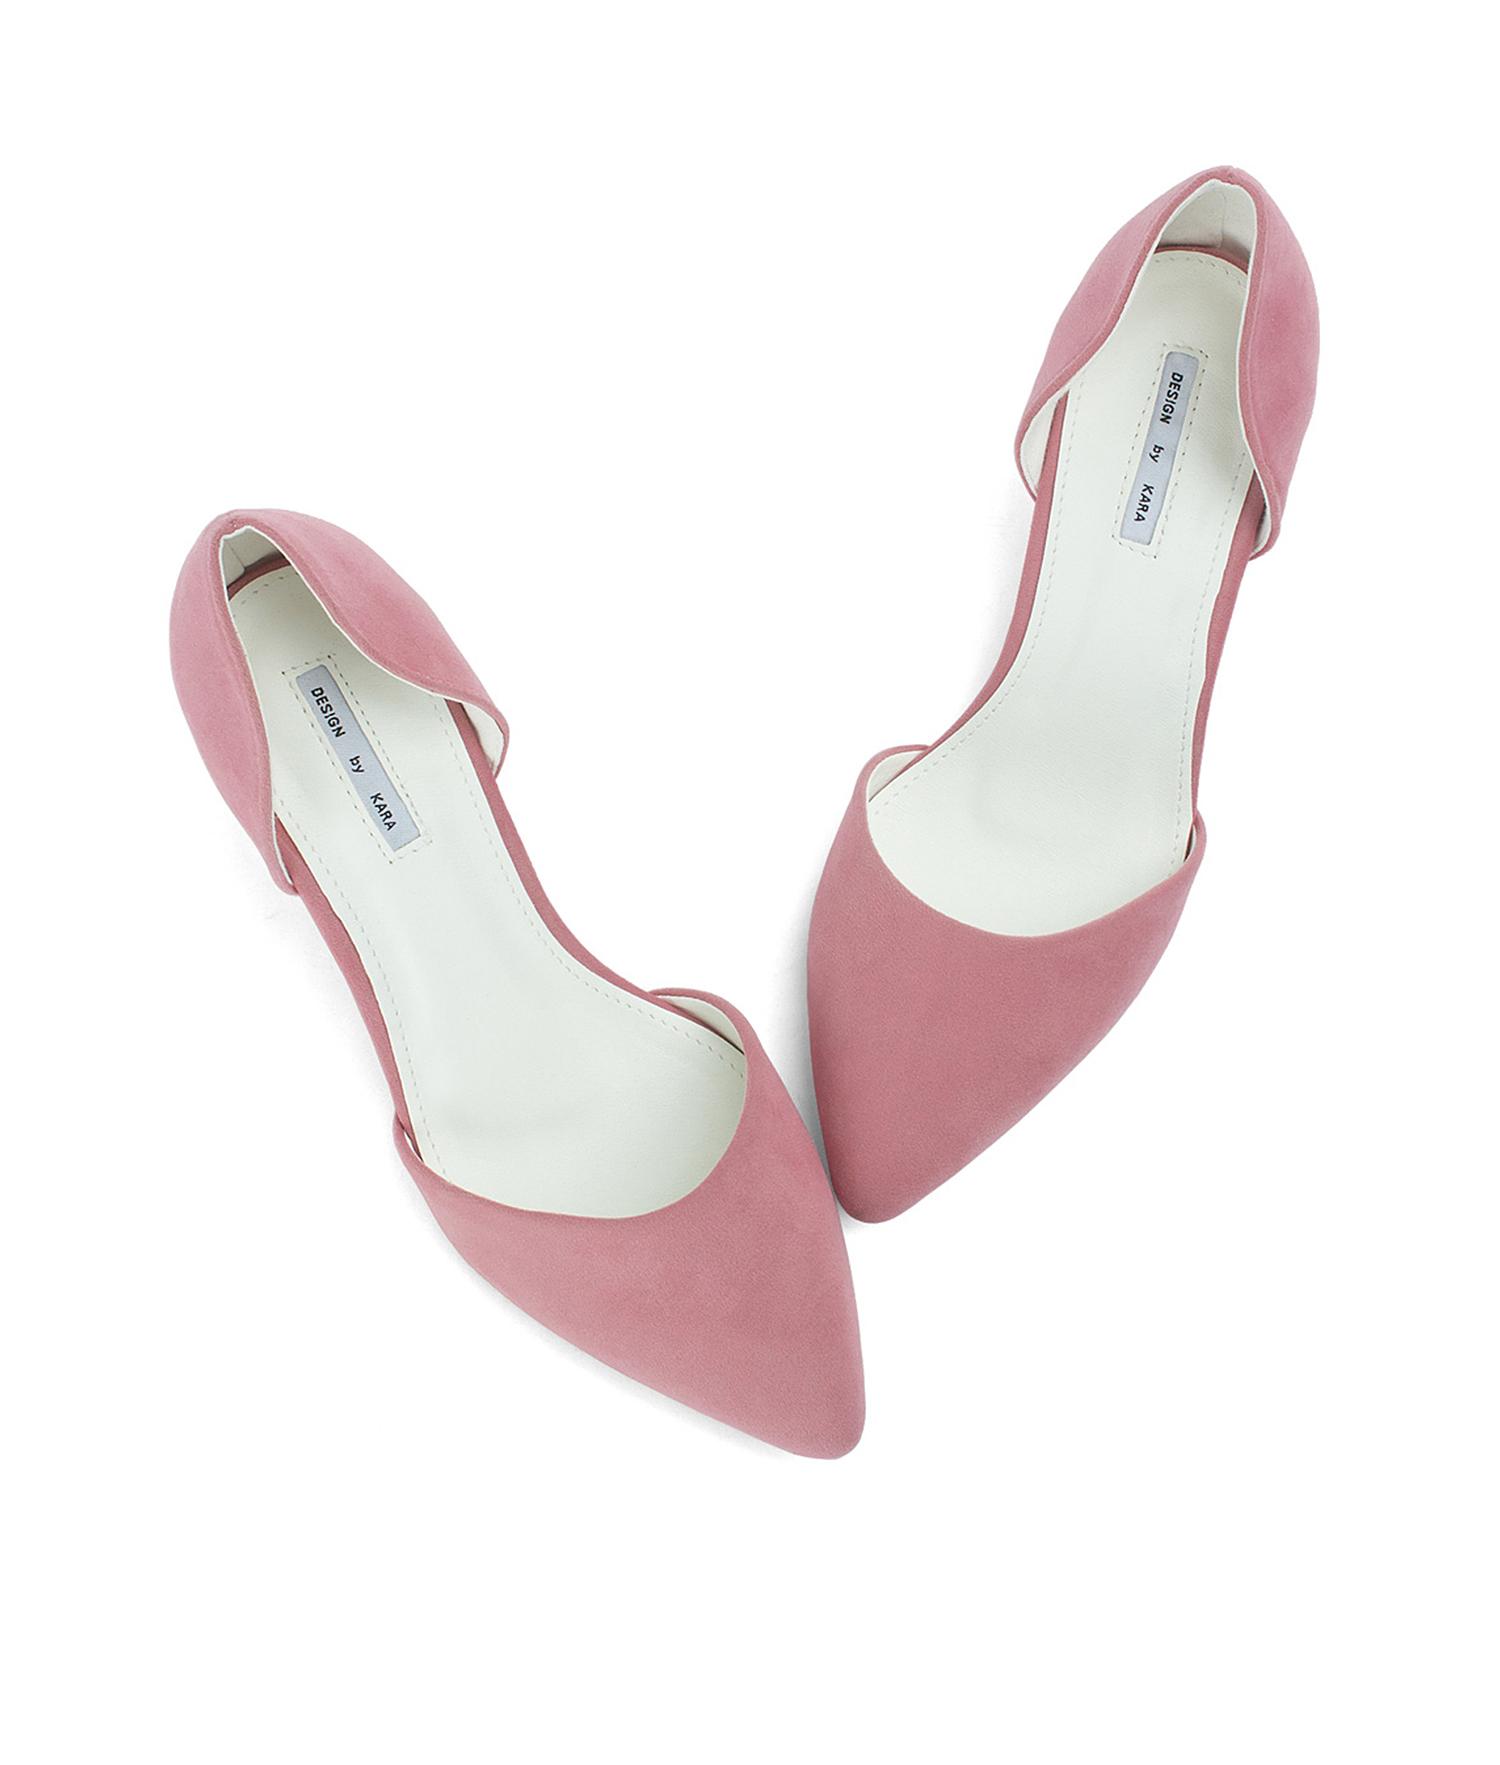 4d9b85e8c5cb AnnaKastle Womens Faux Suede d Orsay Kitten Heels PinkSherbet